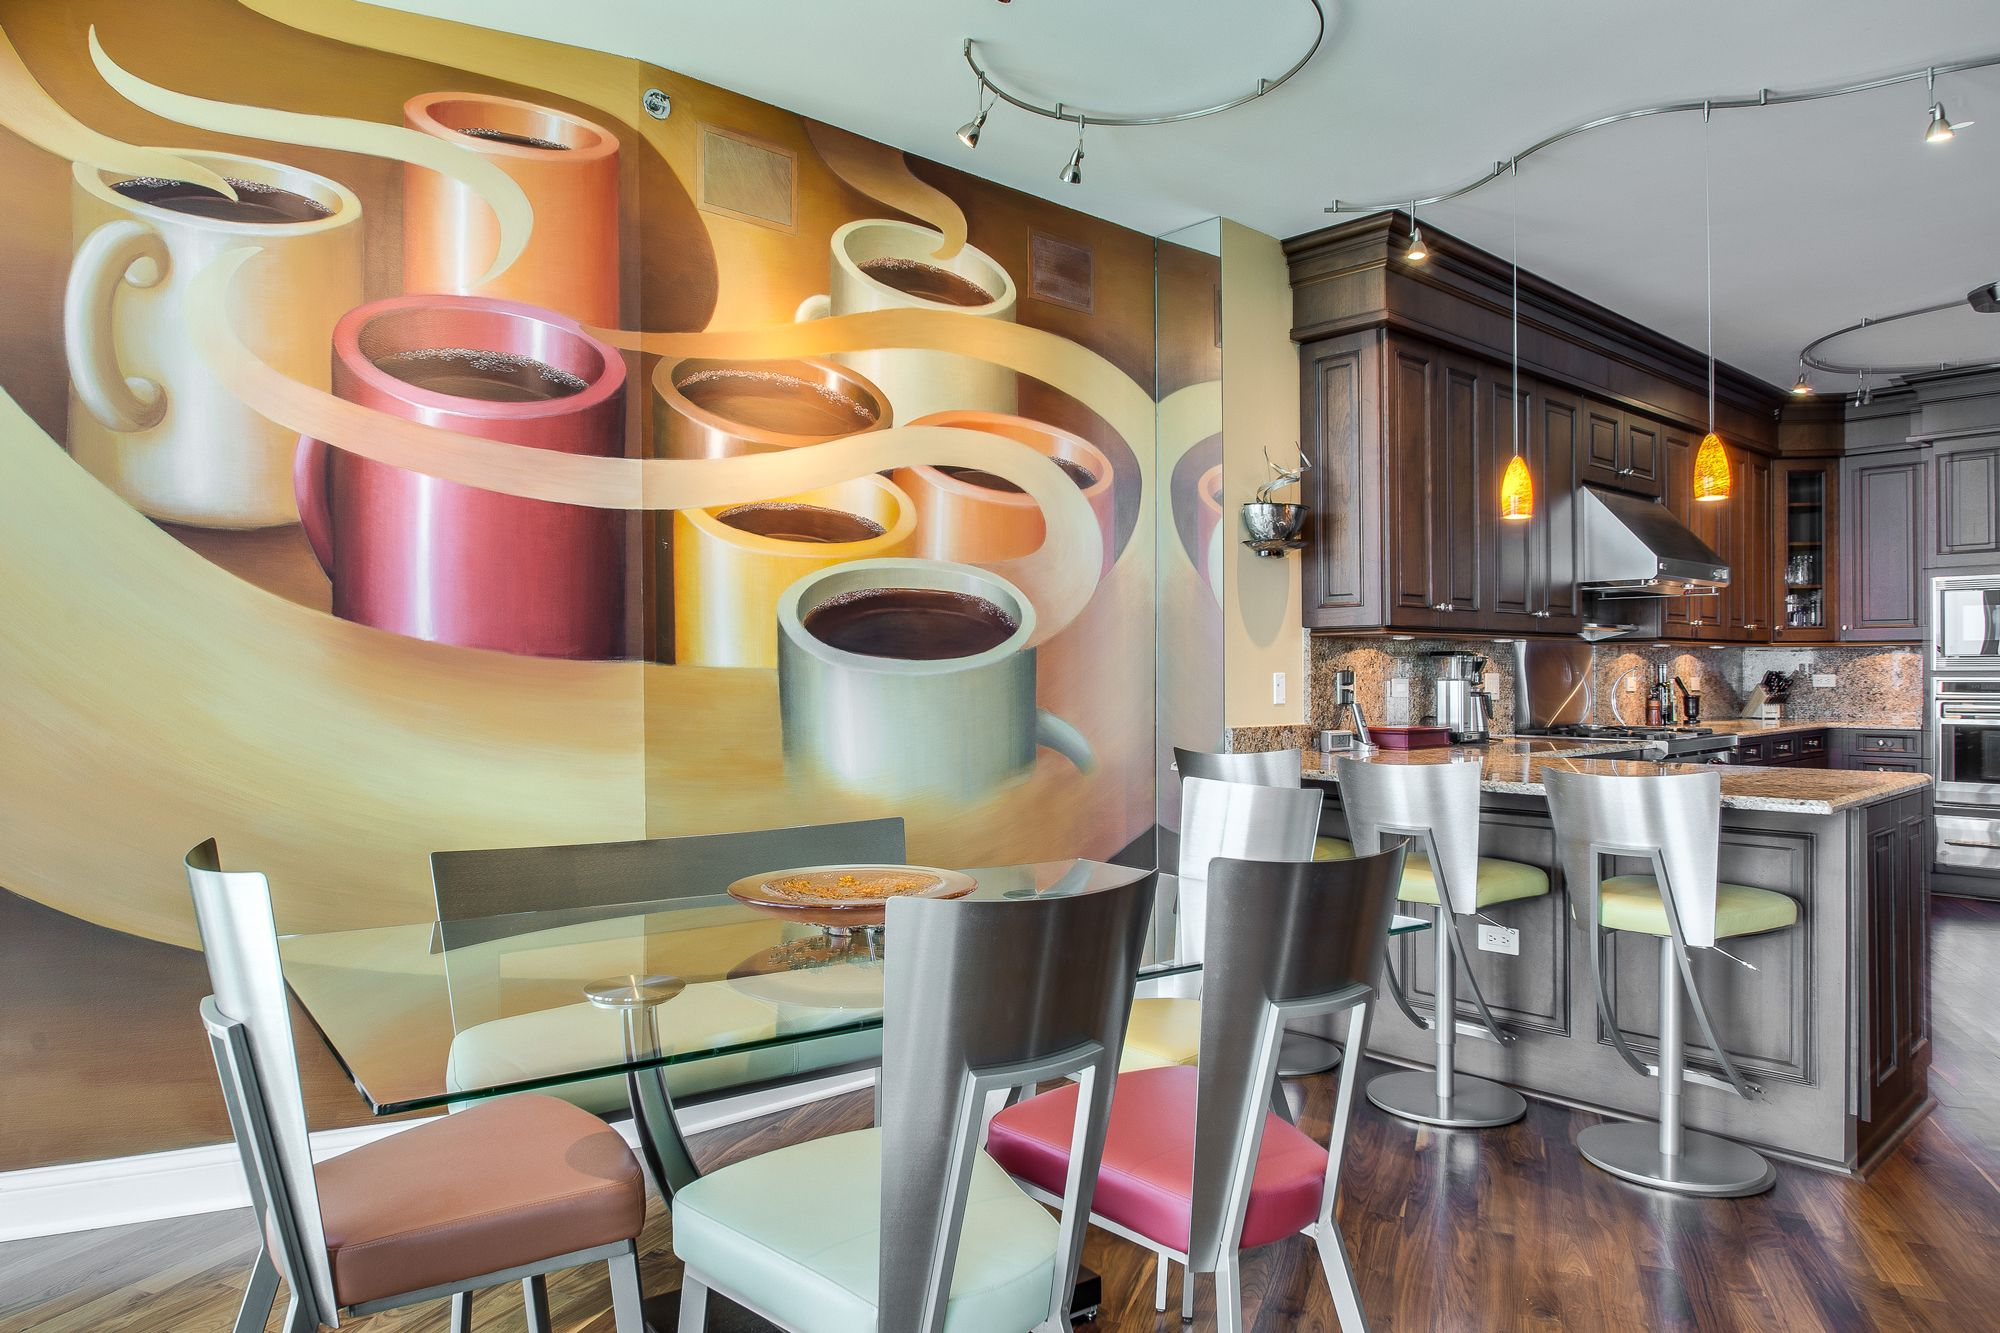 indoor lighting designer. Designer Edge Lighting. Monorail Systems With Spirit Heads By Lighting | Indoor 7